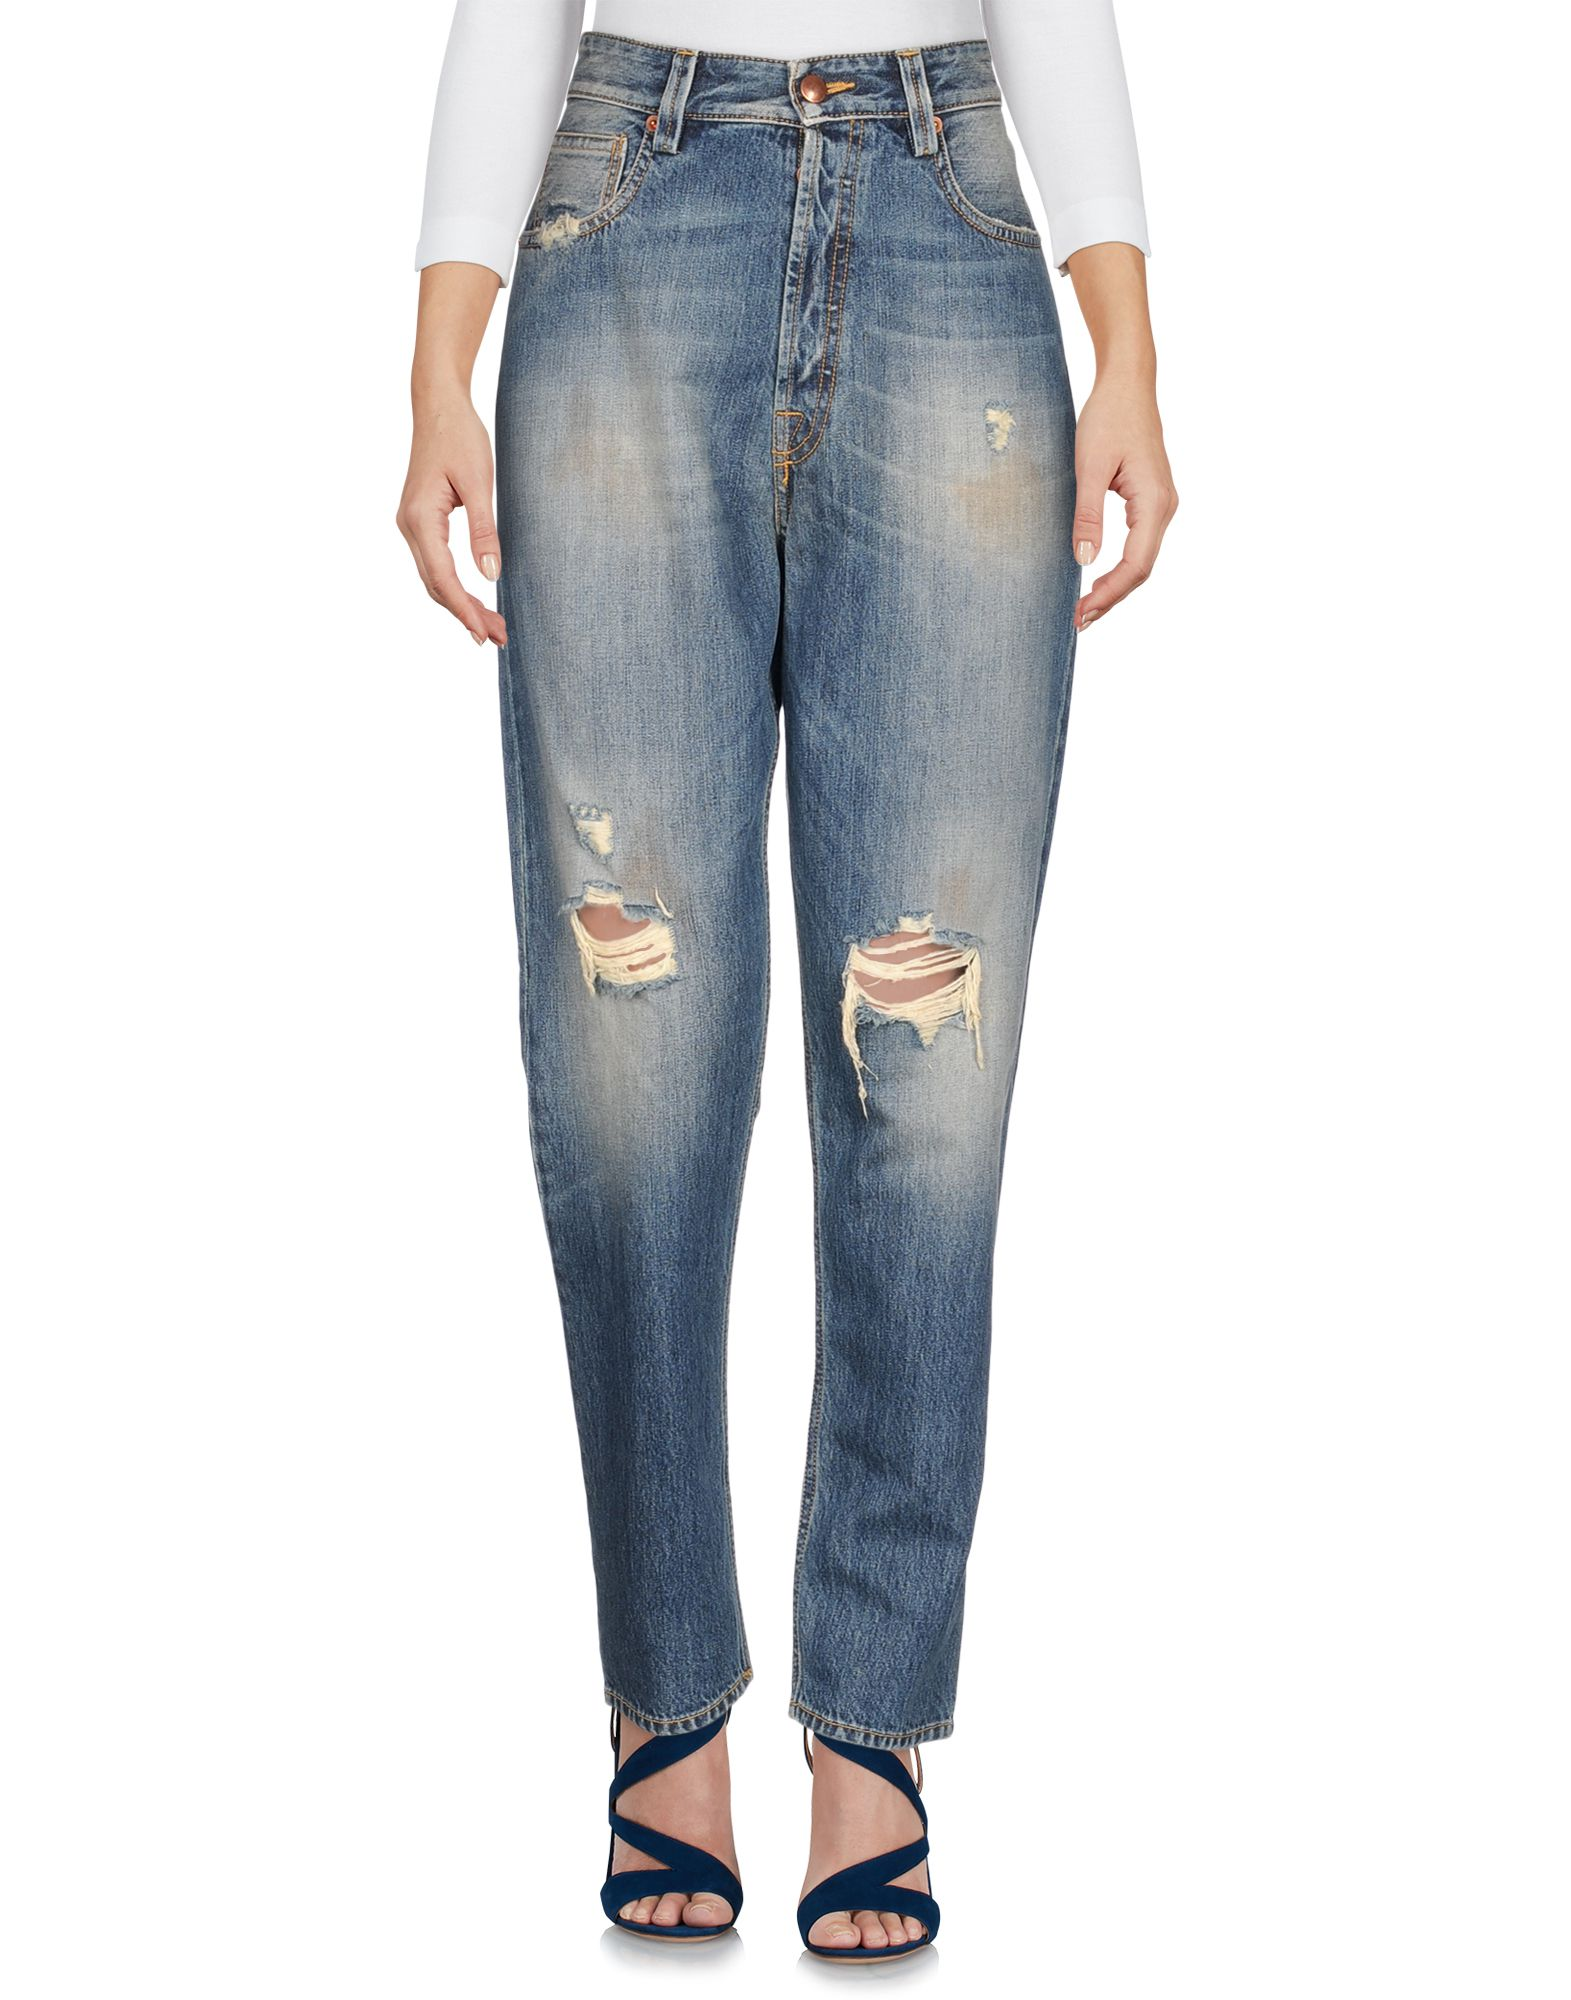 TERESA DAINELLI Denim Pants in Blue